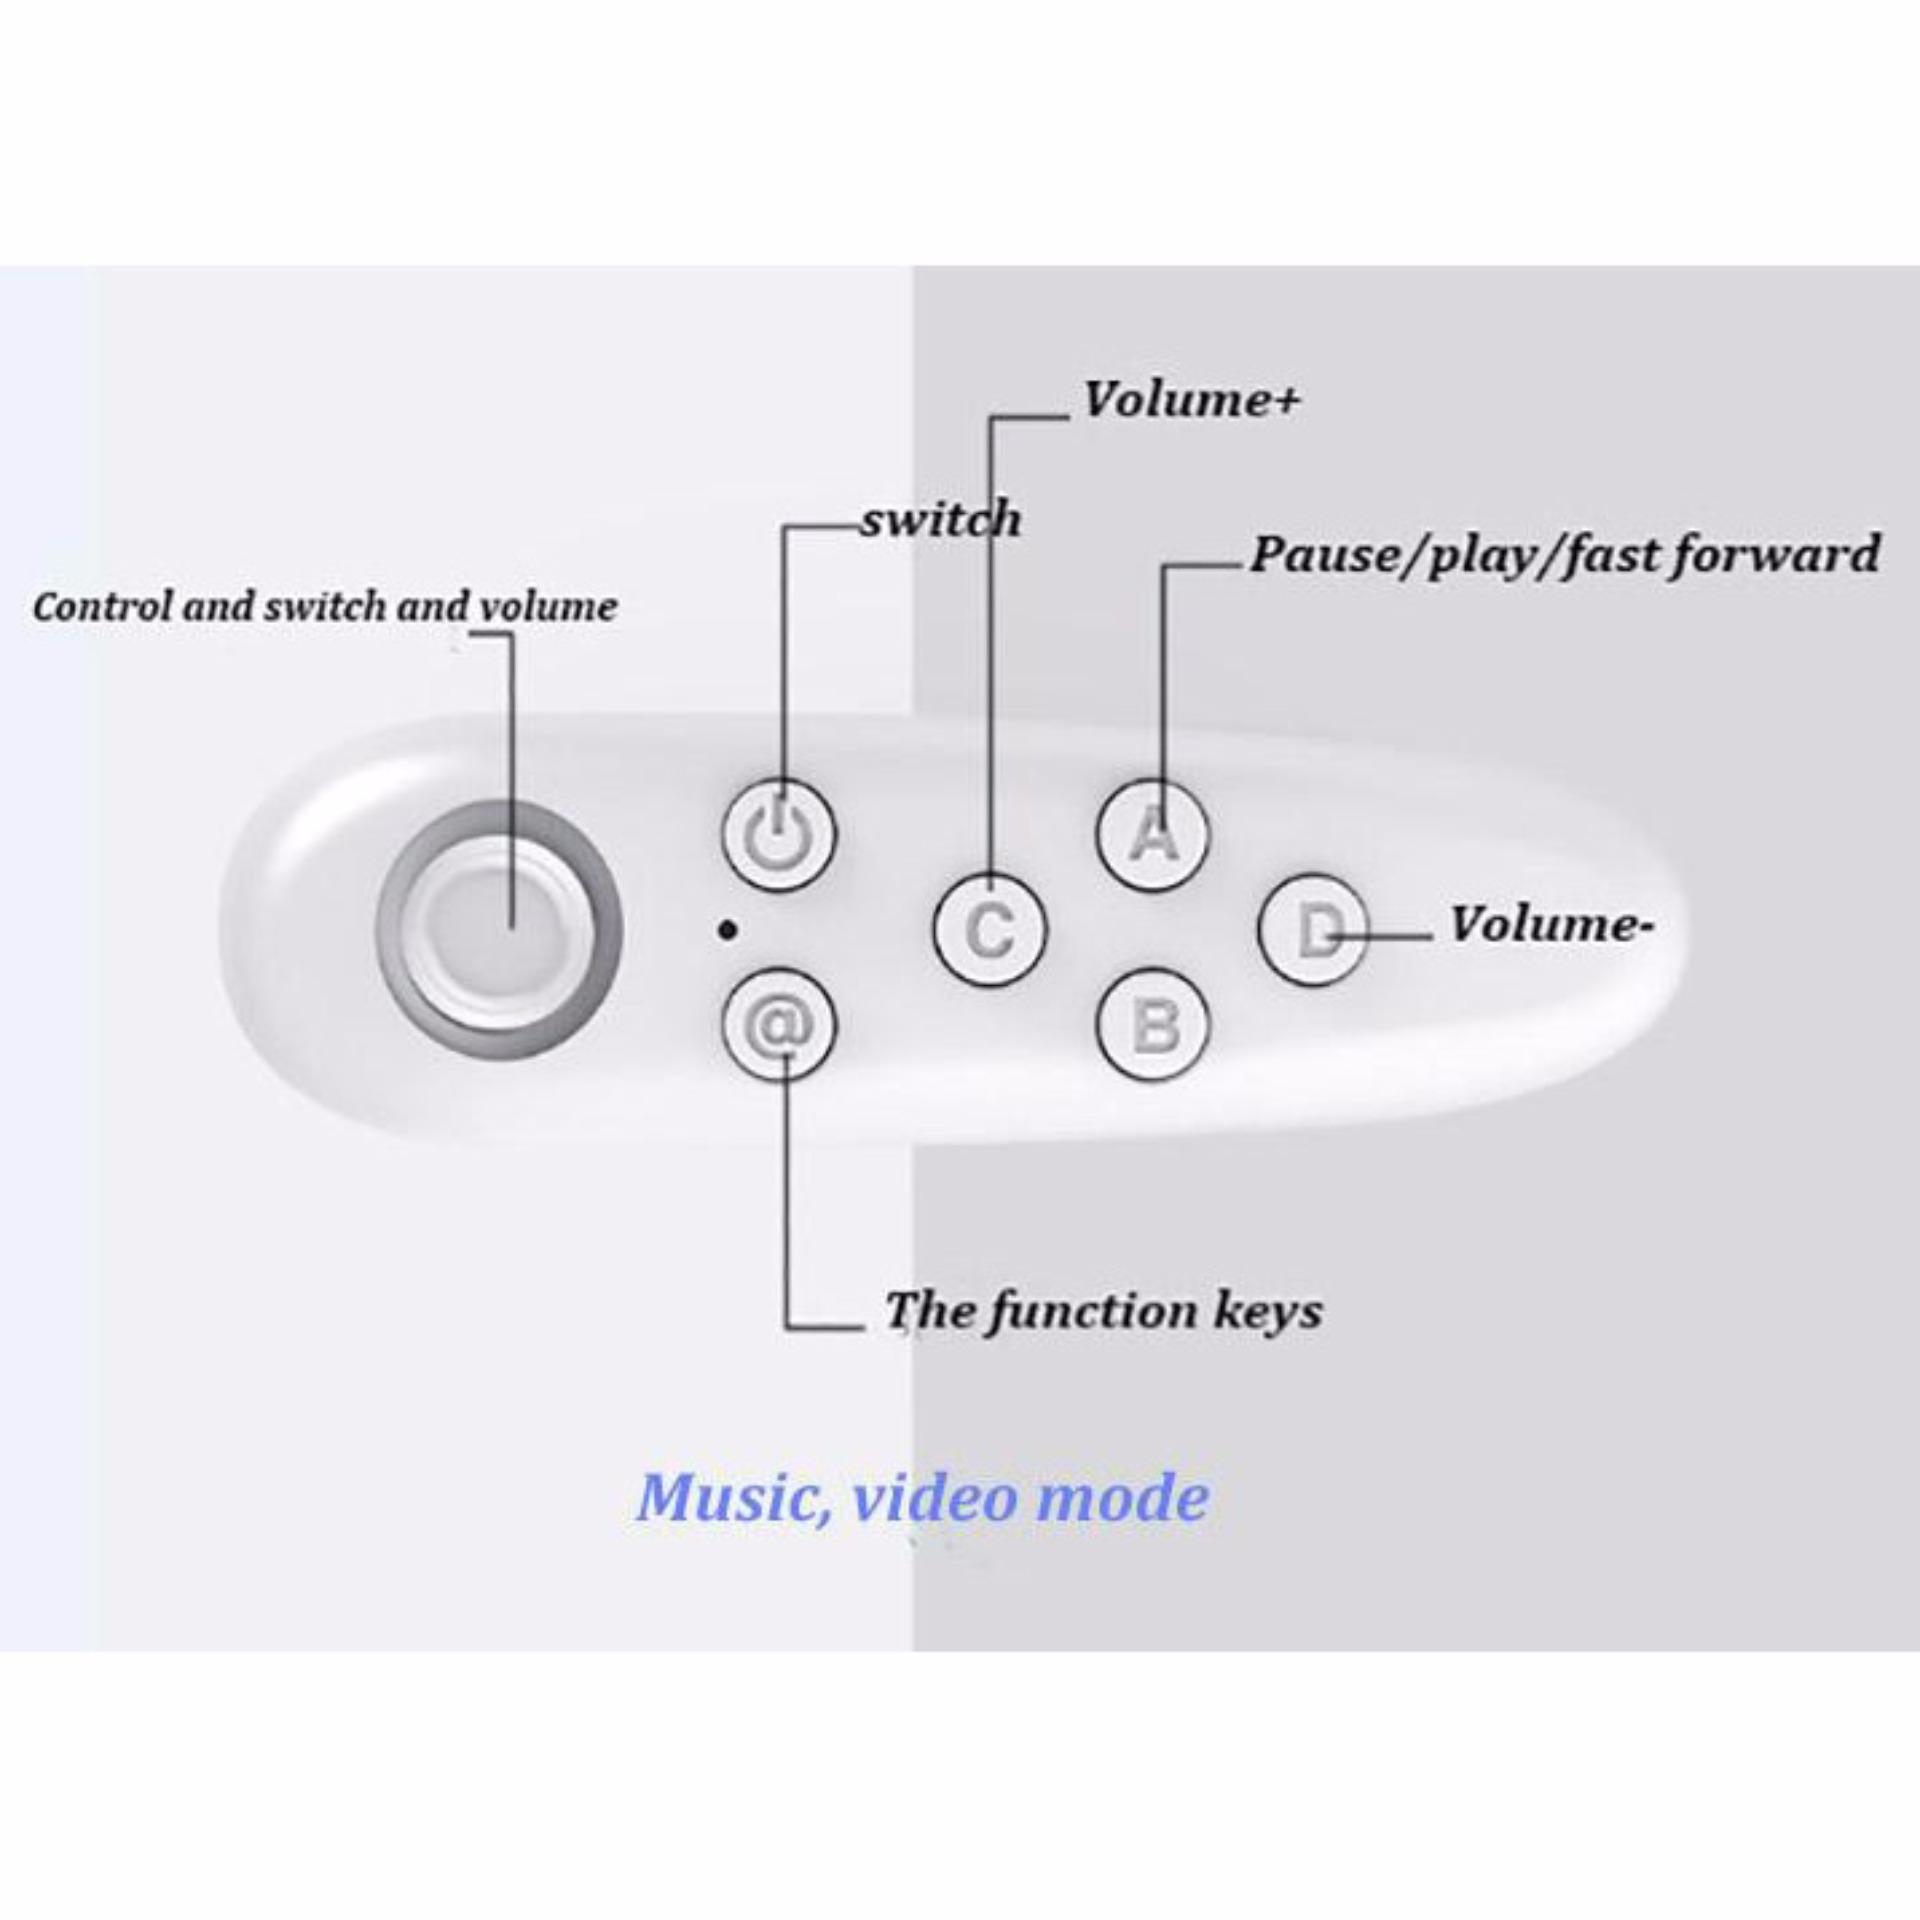 Miibox Vr Box Bluetooth Smartphone Gamepad Controller White Black